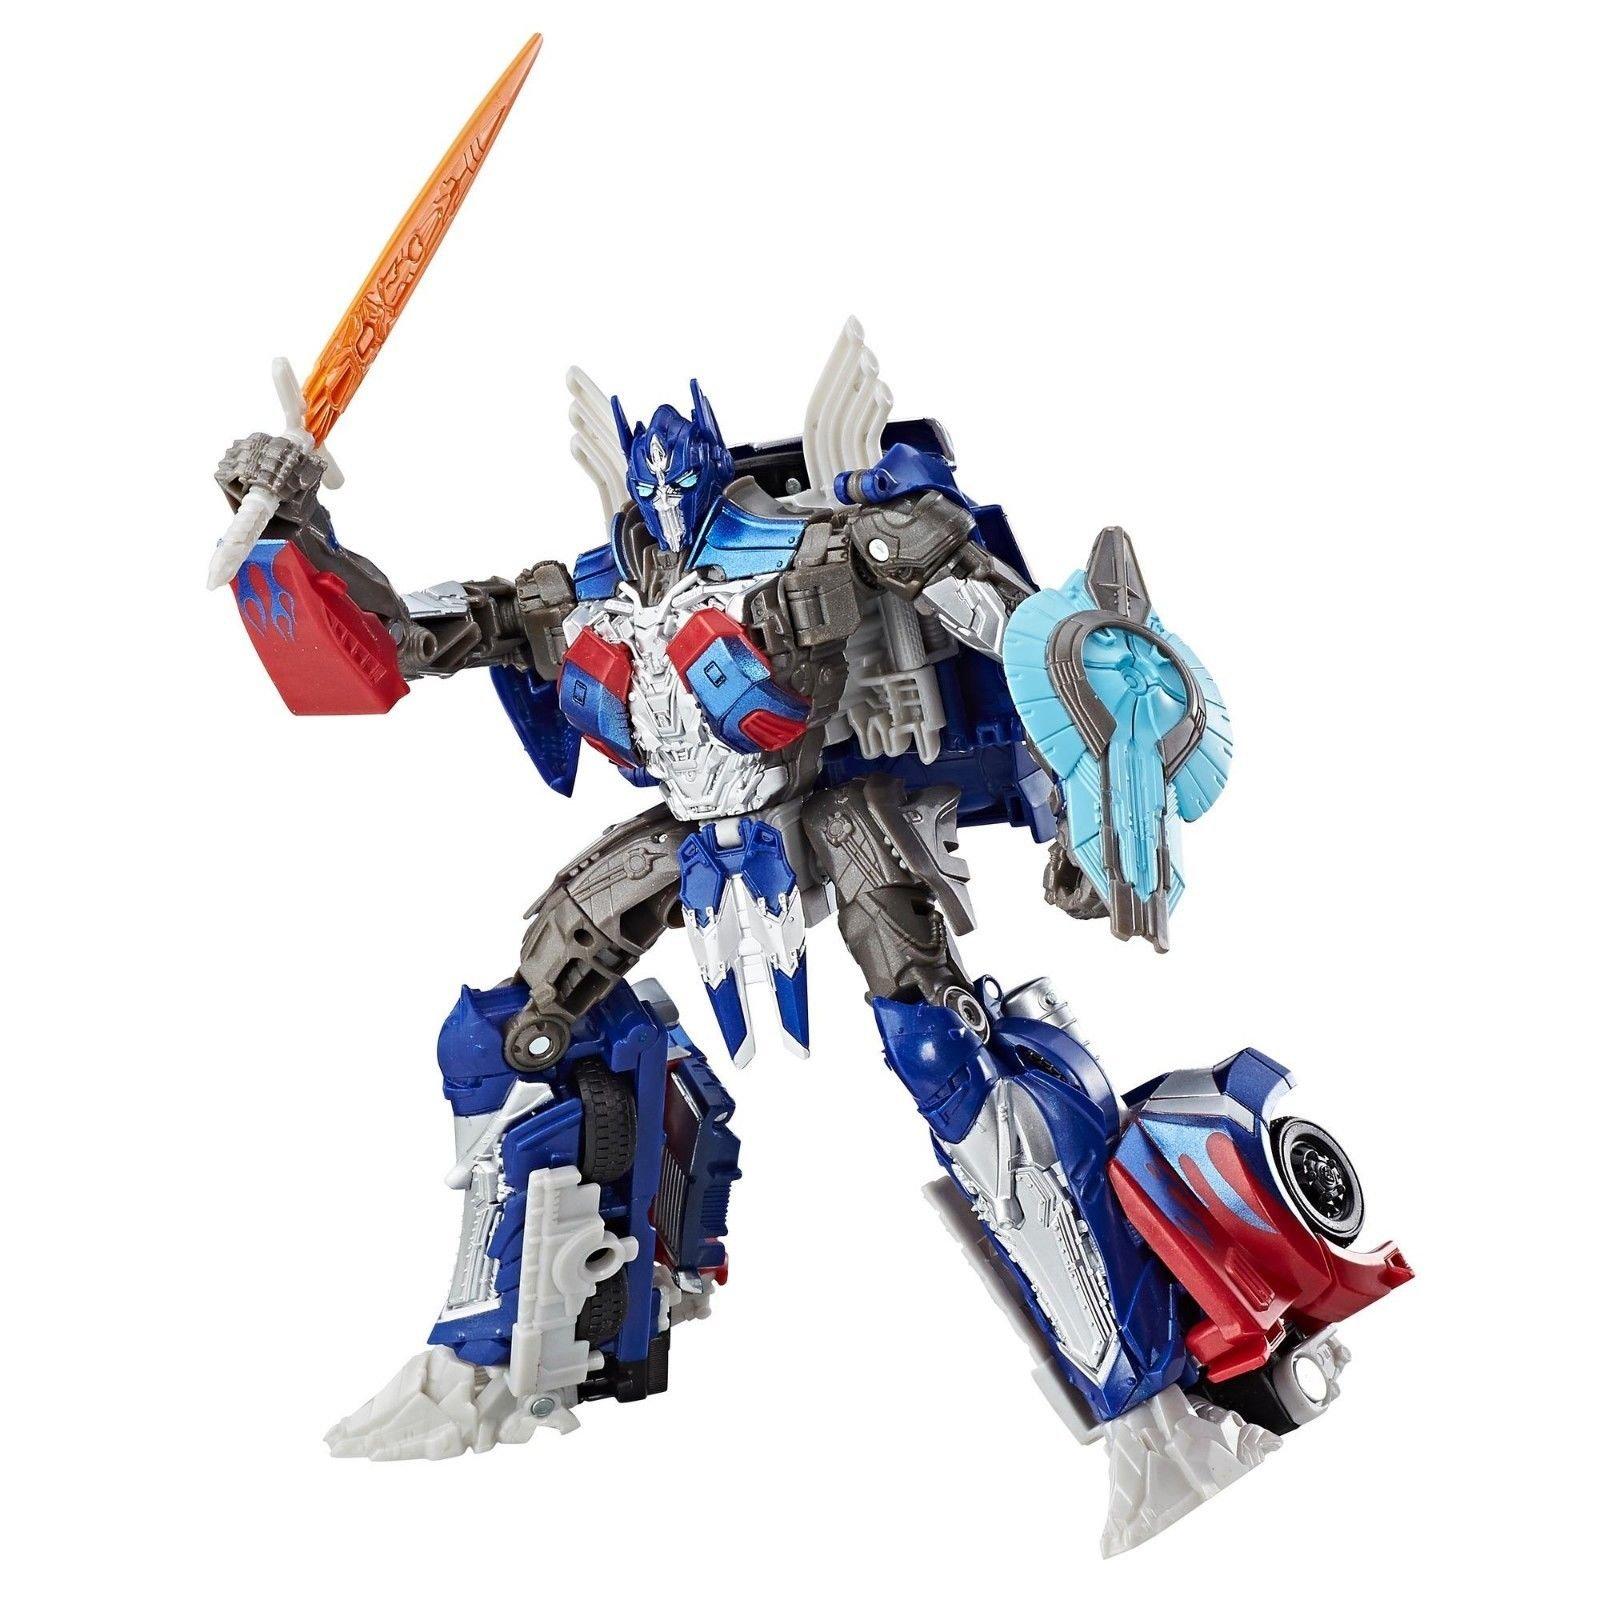 【SALE】Hasbro Transformers MV5 The Last Knight Legion Class Optimus Prime